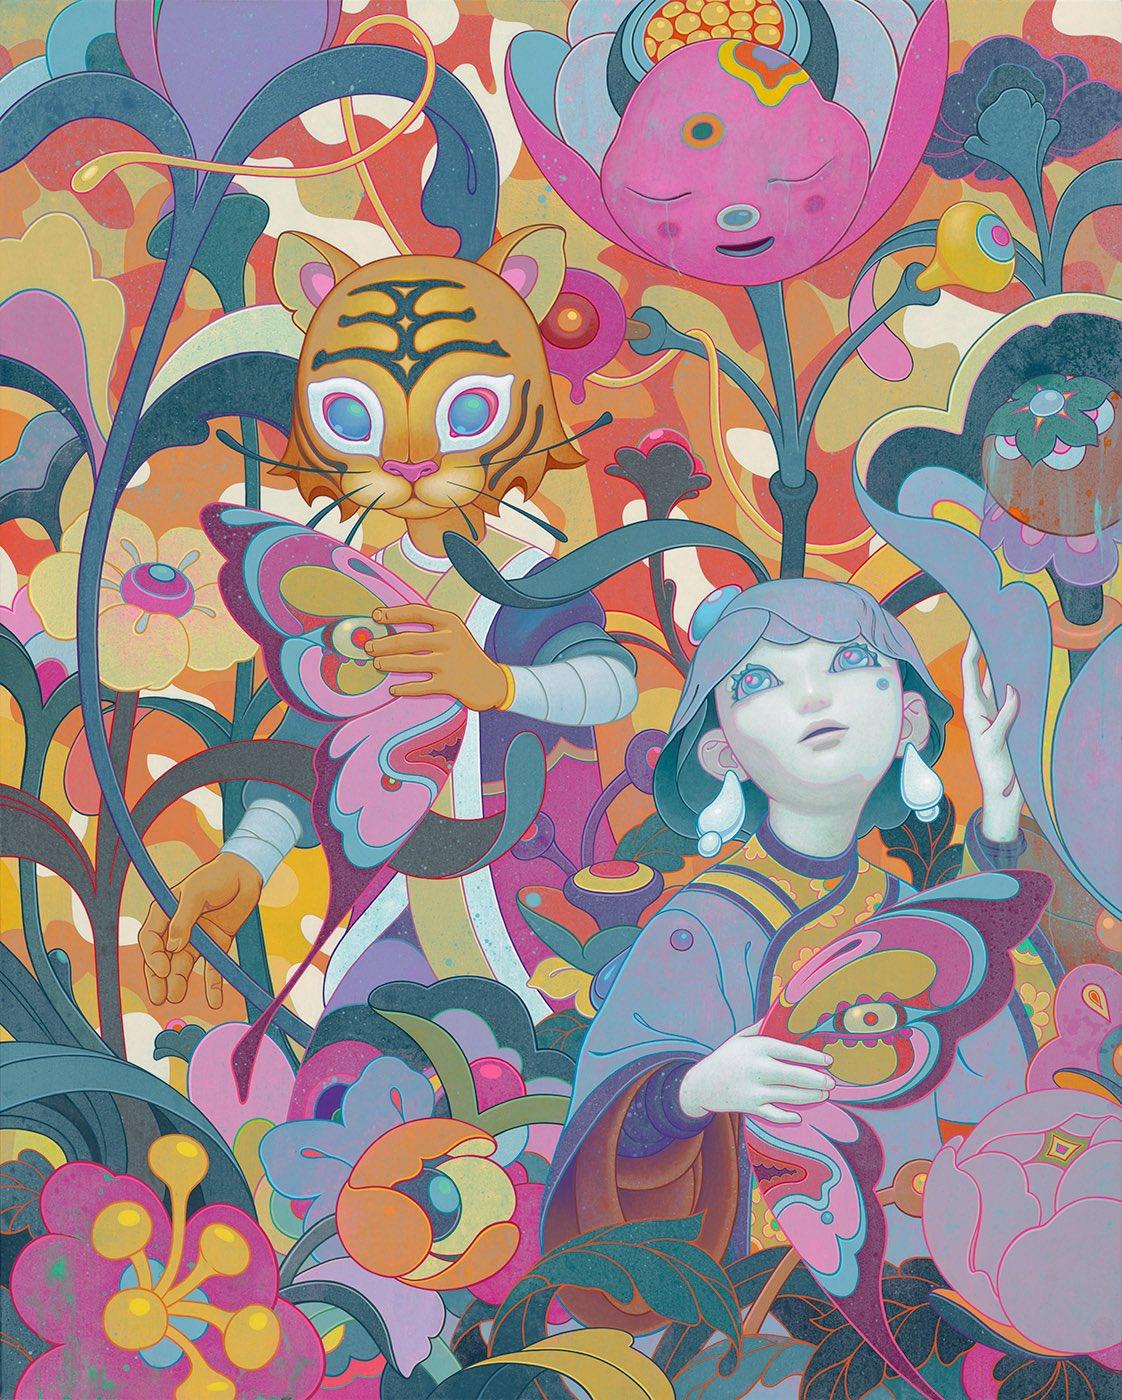 "✨ New work: Monarch. Acrylic on Canvas, 48x60"", 2019. https://t.co/8shJLSTNq1"